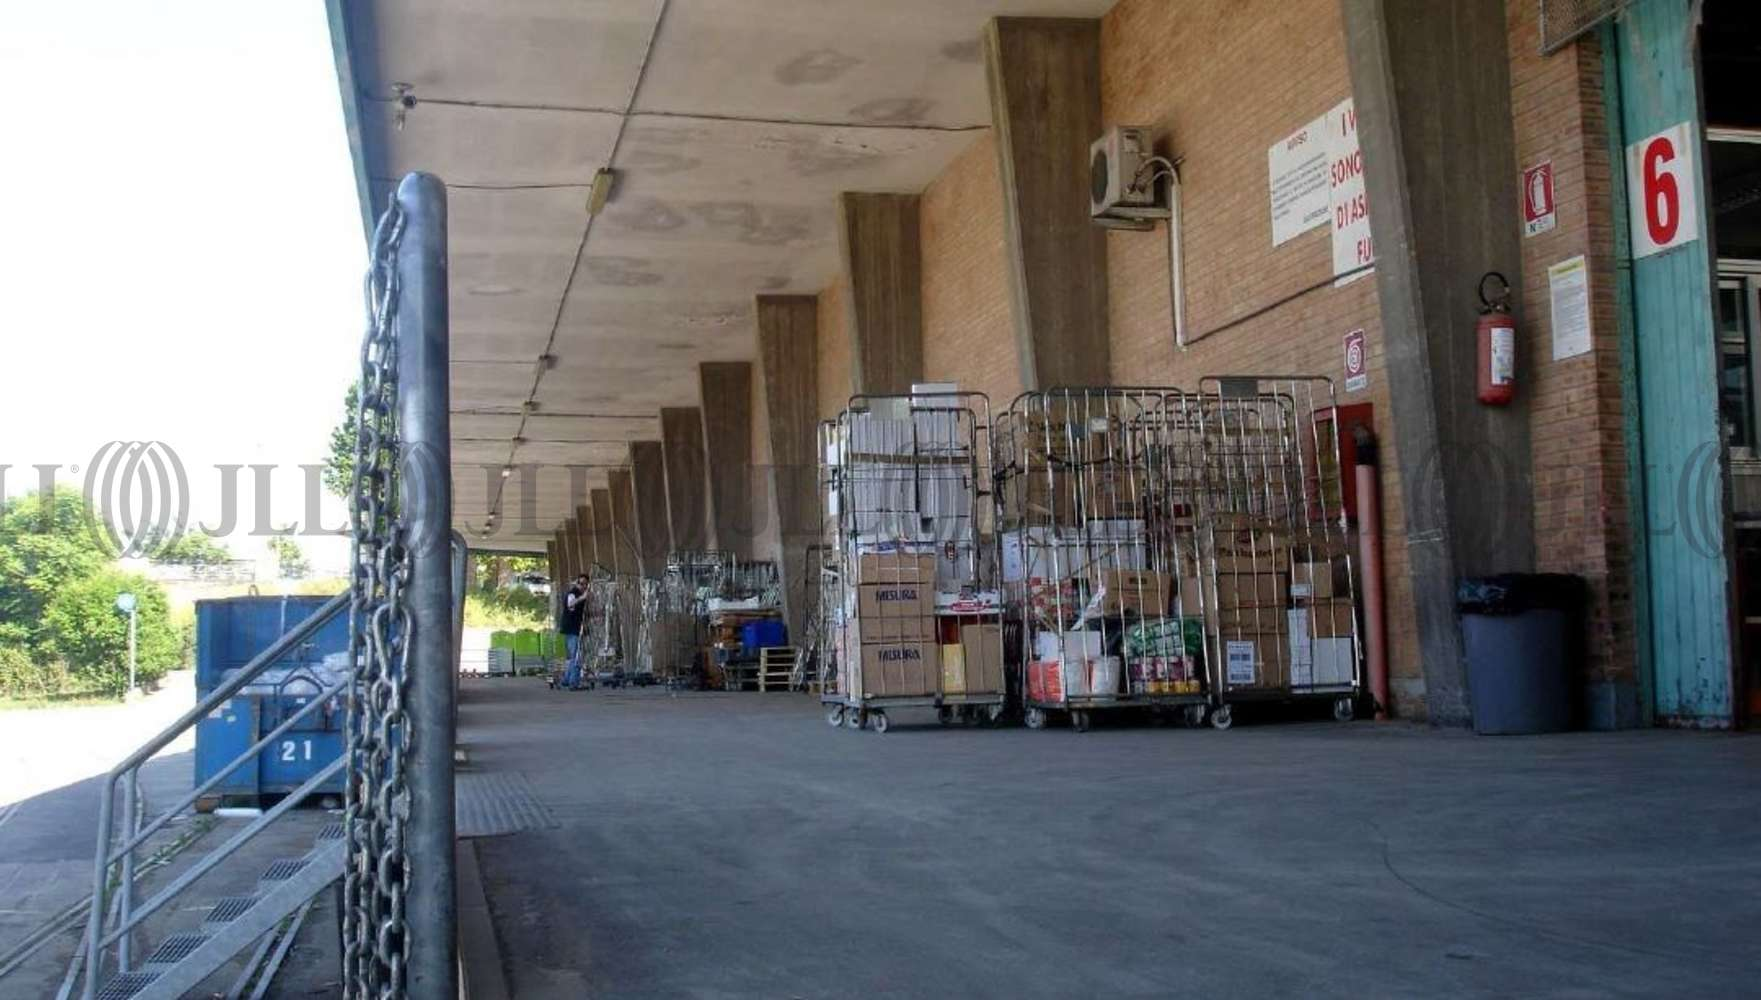 Magazzini industriali e logistici Cesena, 47521 - Cesena Warehouse